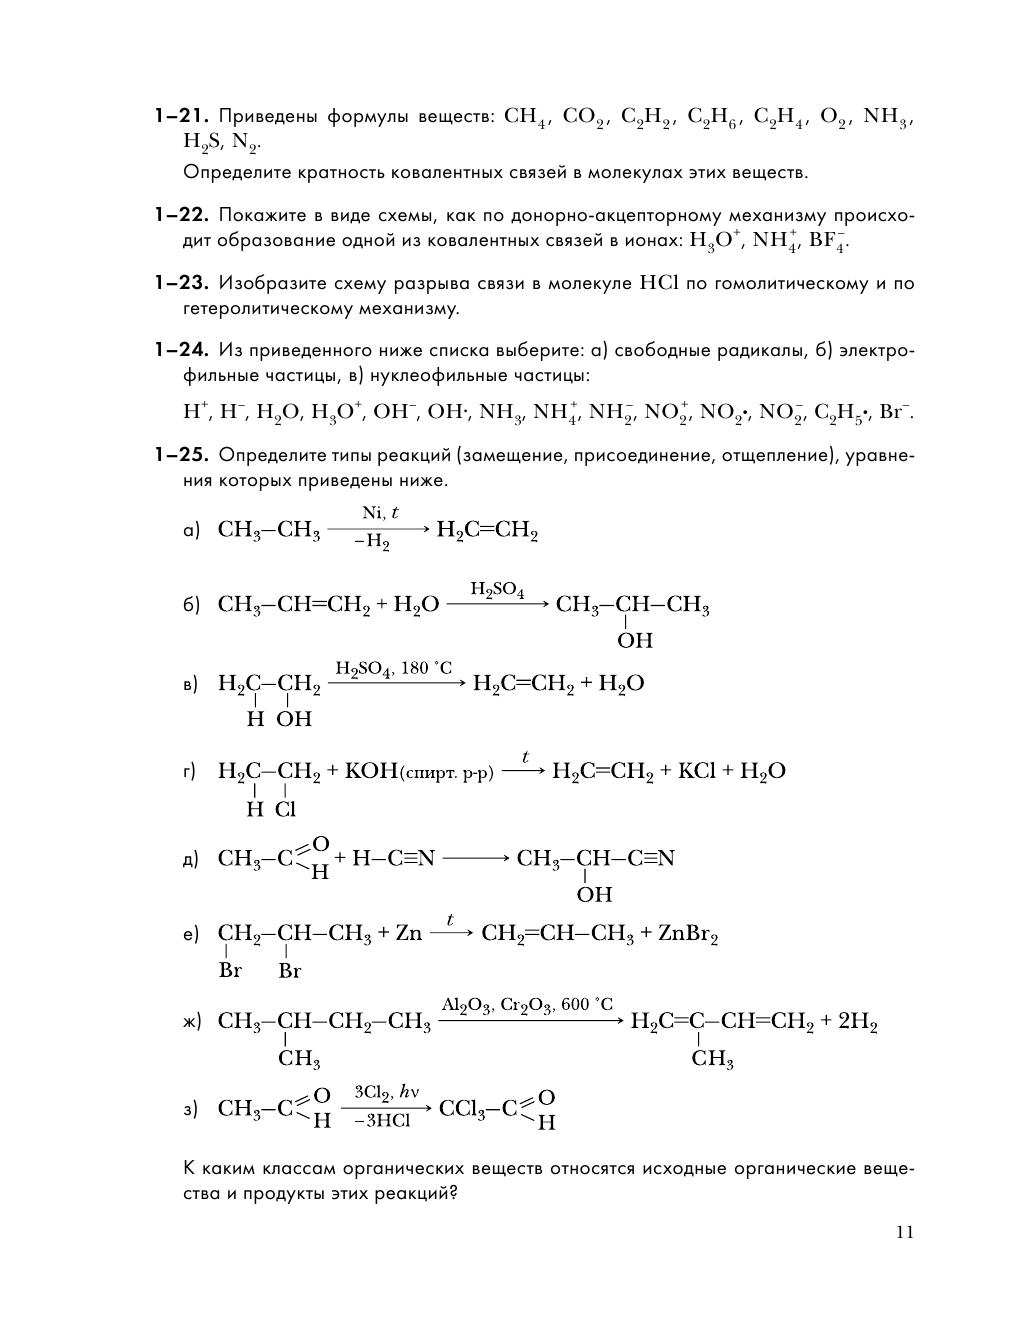 Задачи по химии 10 класс кузнецова решение задача на переливания решения и ответы